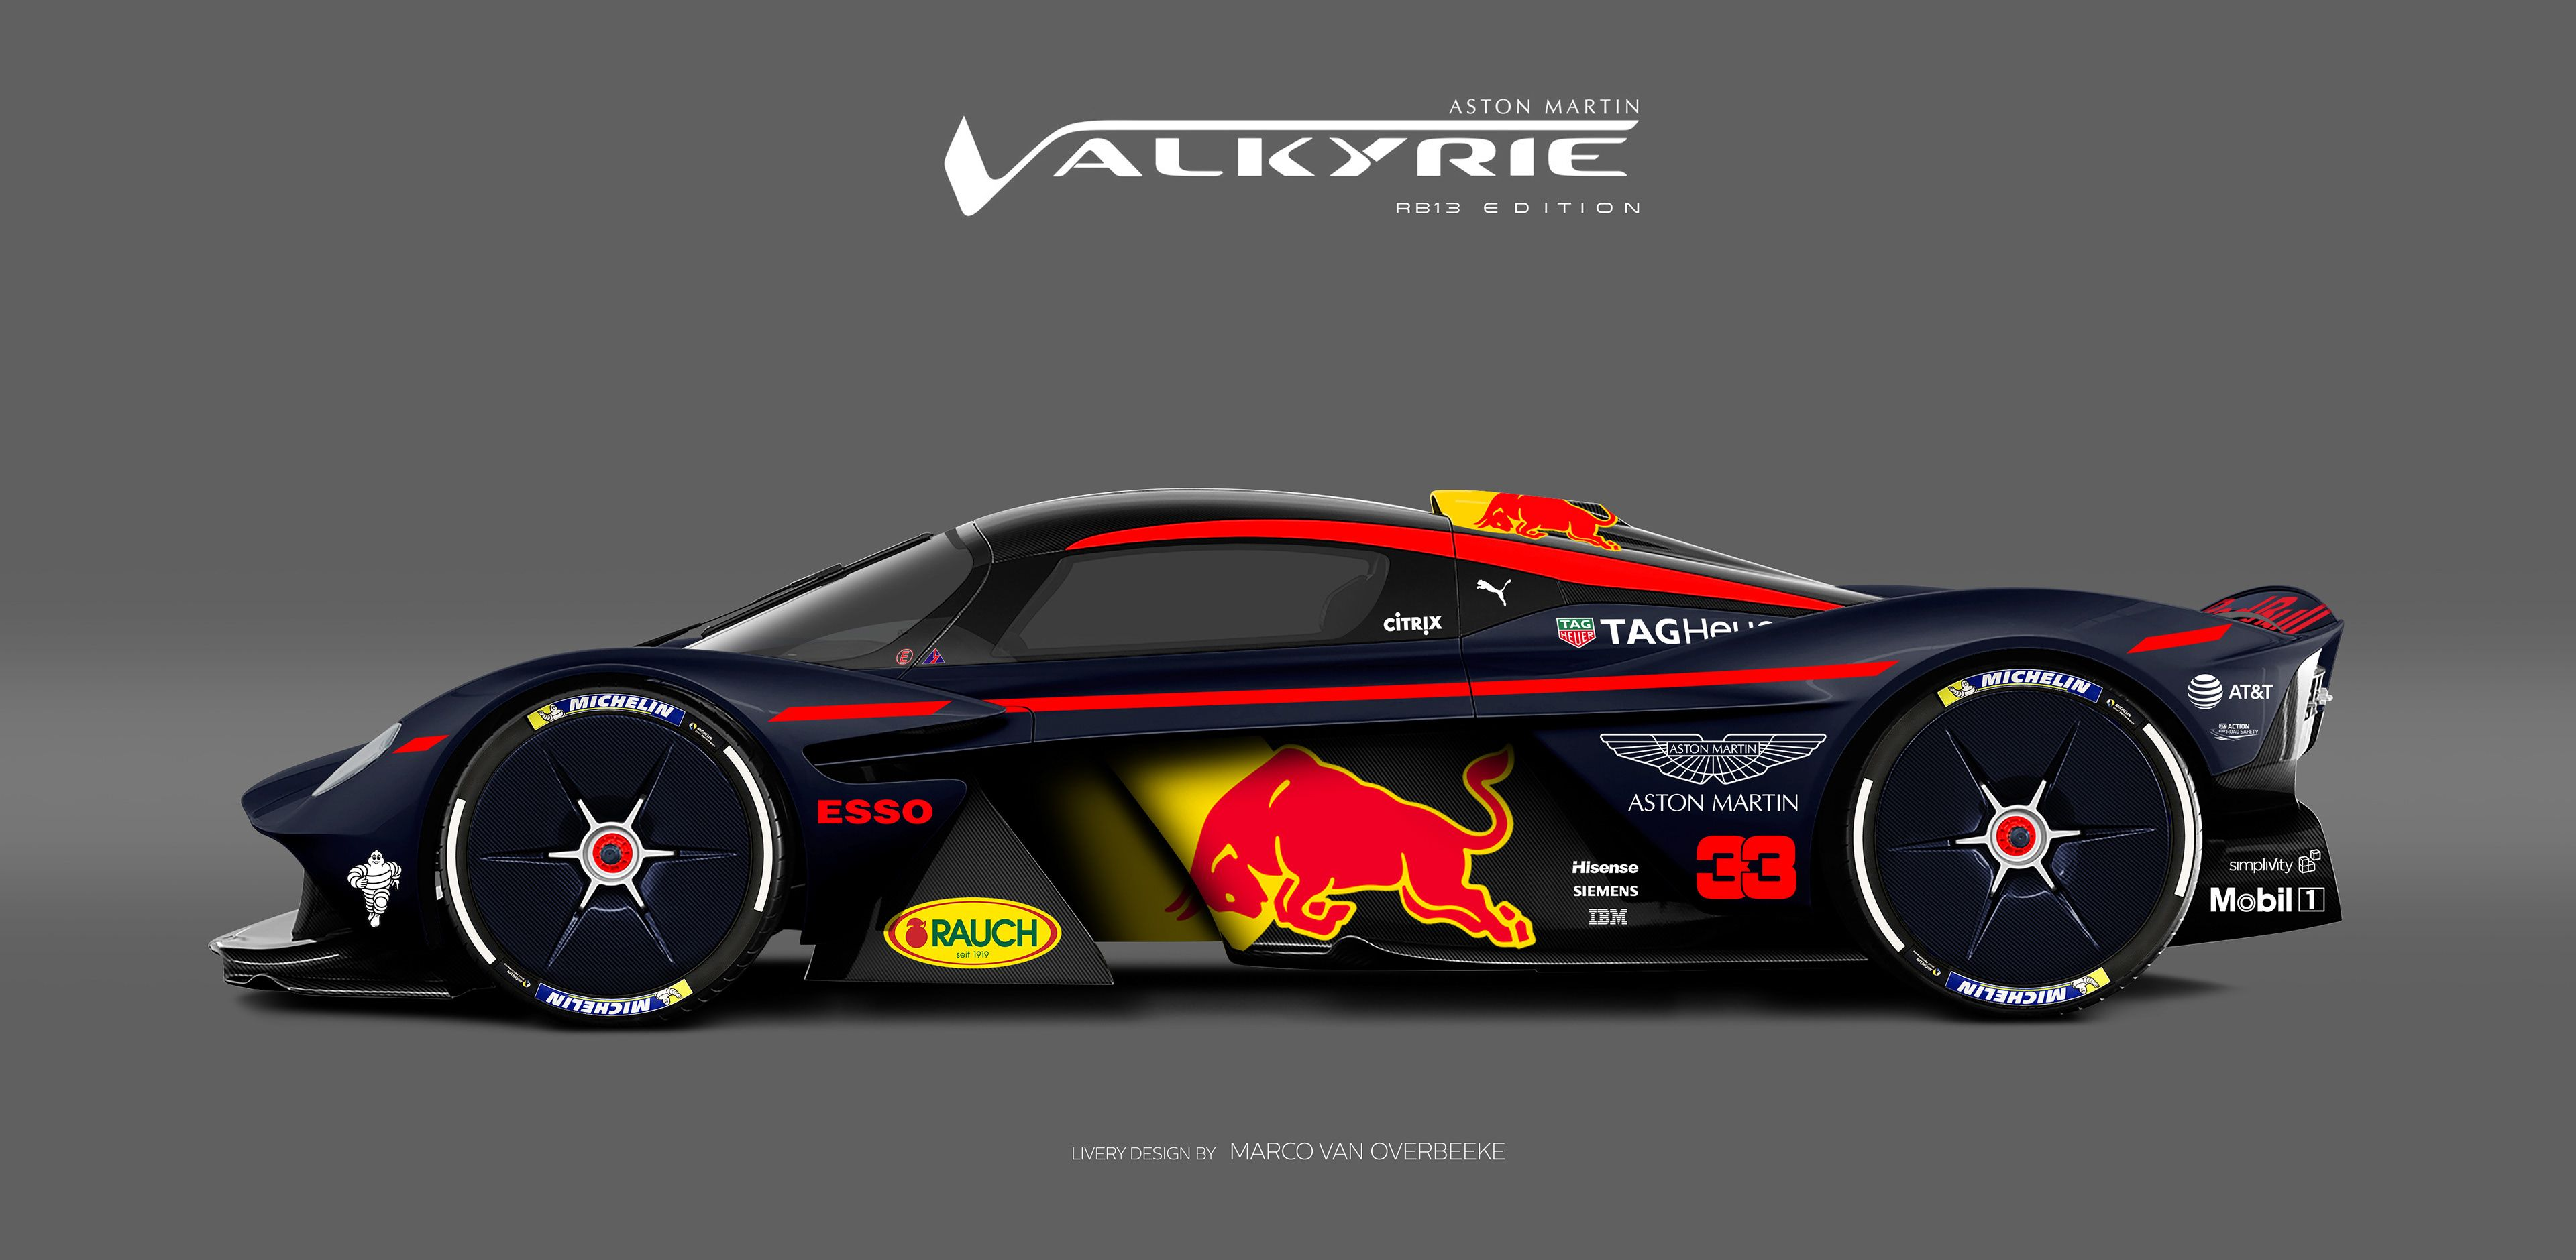 aston martin valkyrie liveries & volante concept & track-only